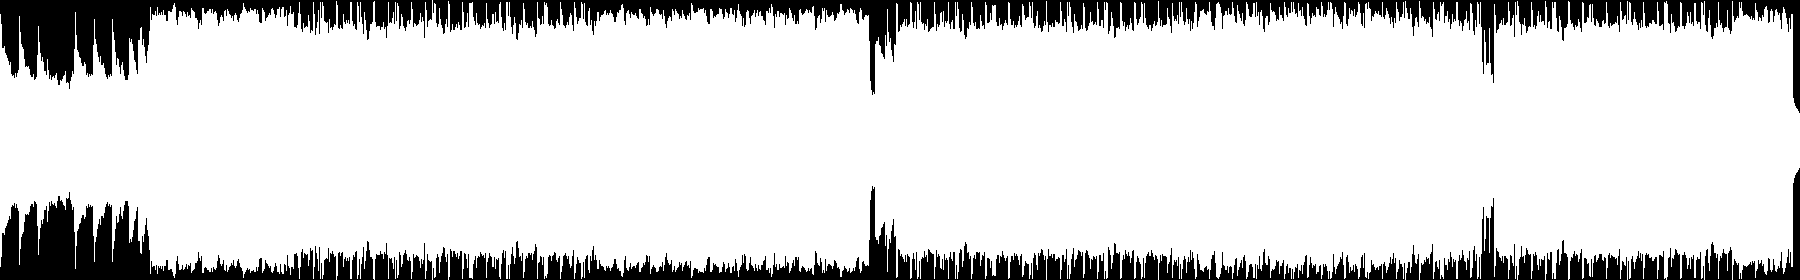 Sylenth Highlands audio waveform